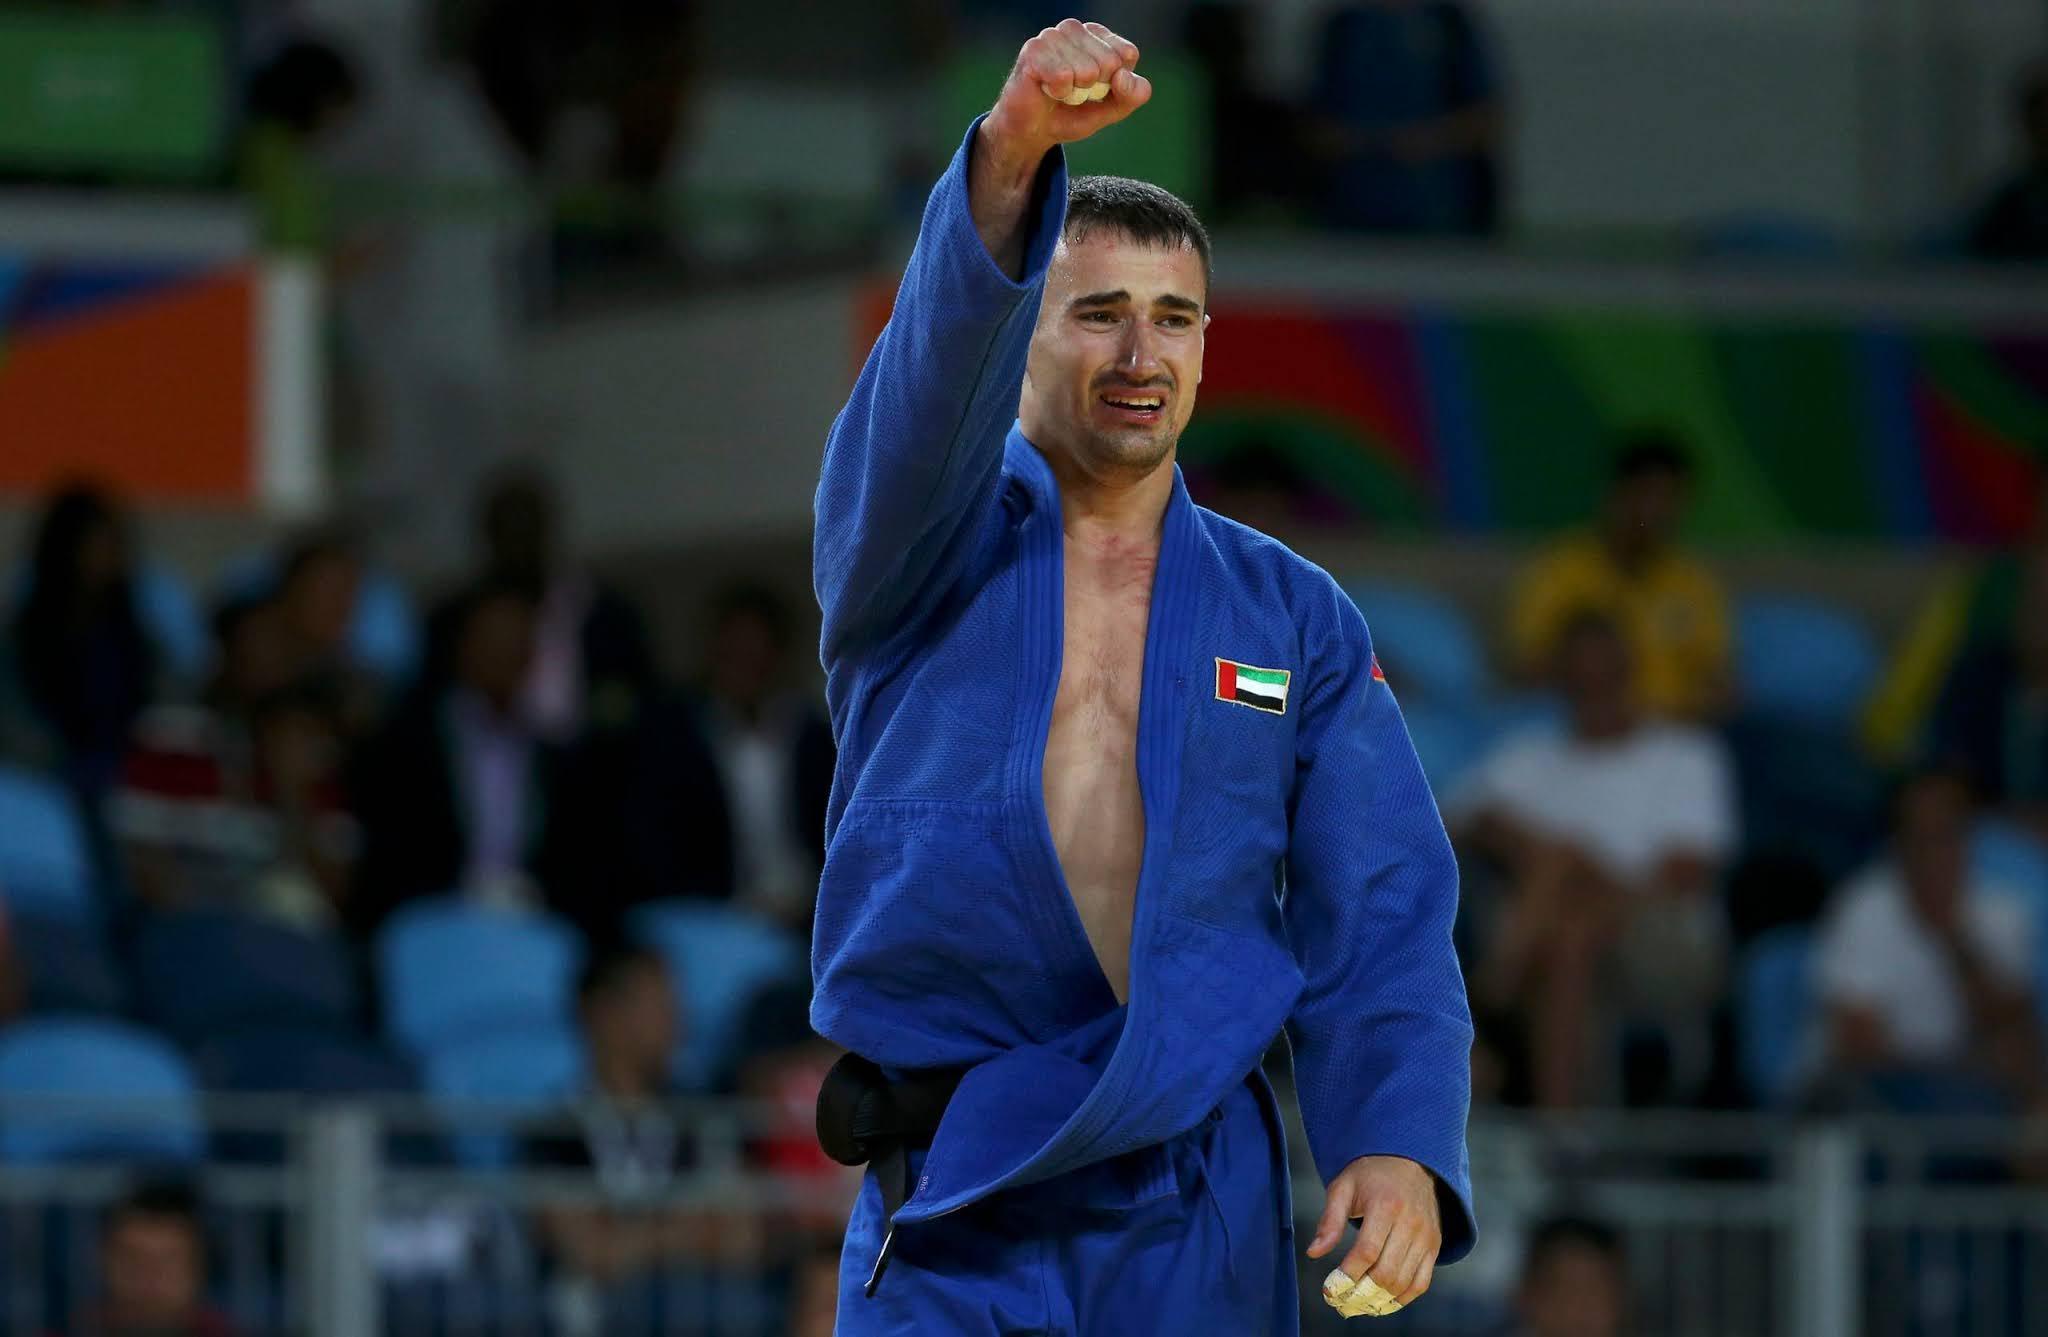 Sergiu Toma comemora medalha na Rio 2016